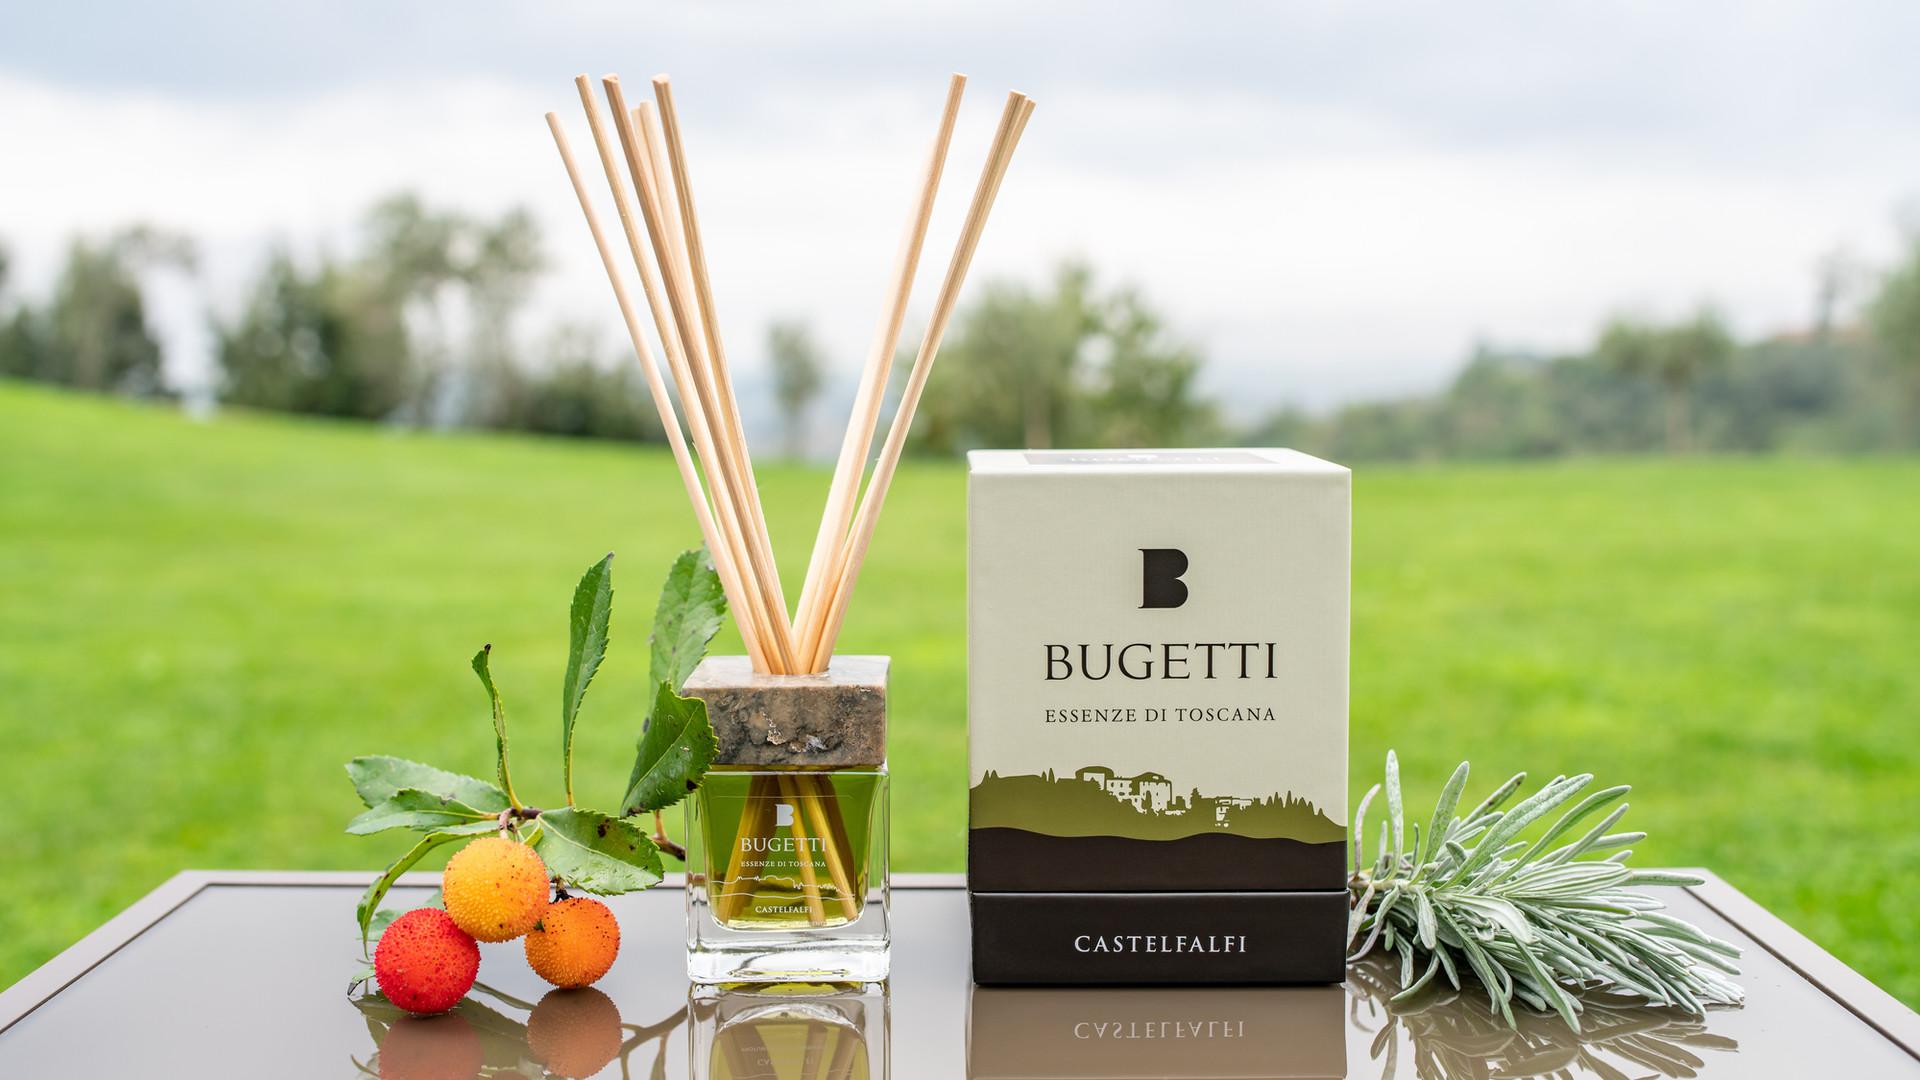 Bugetti x Castelfalfi